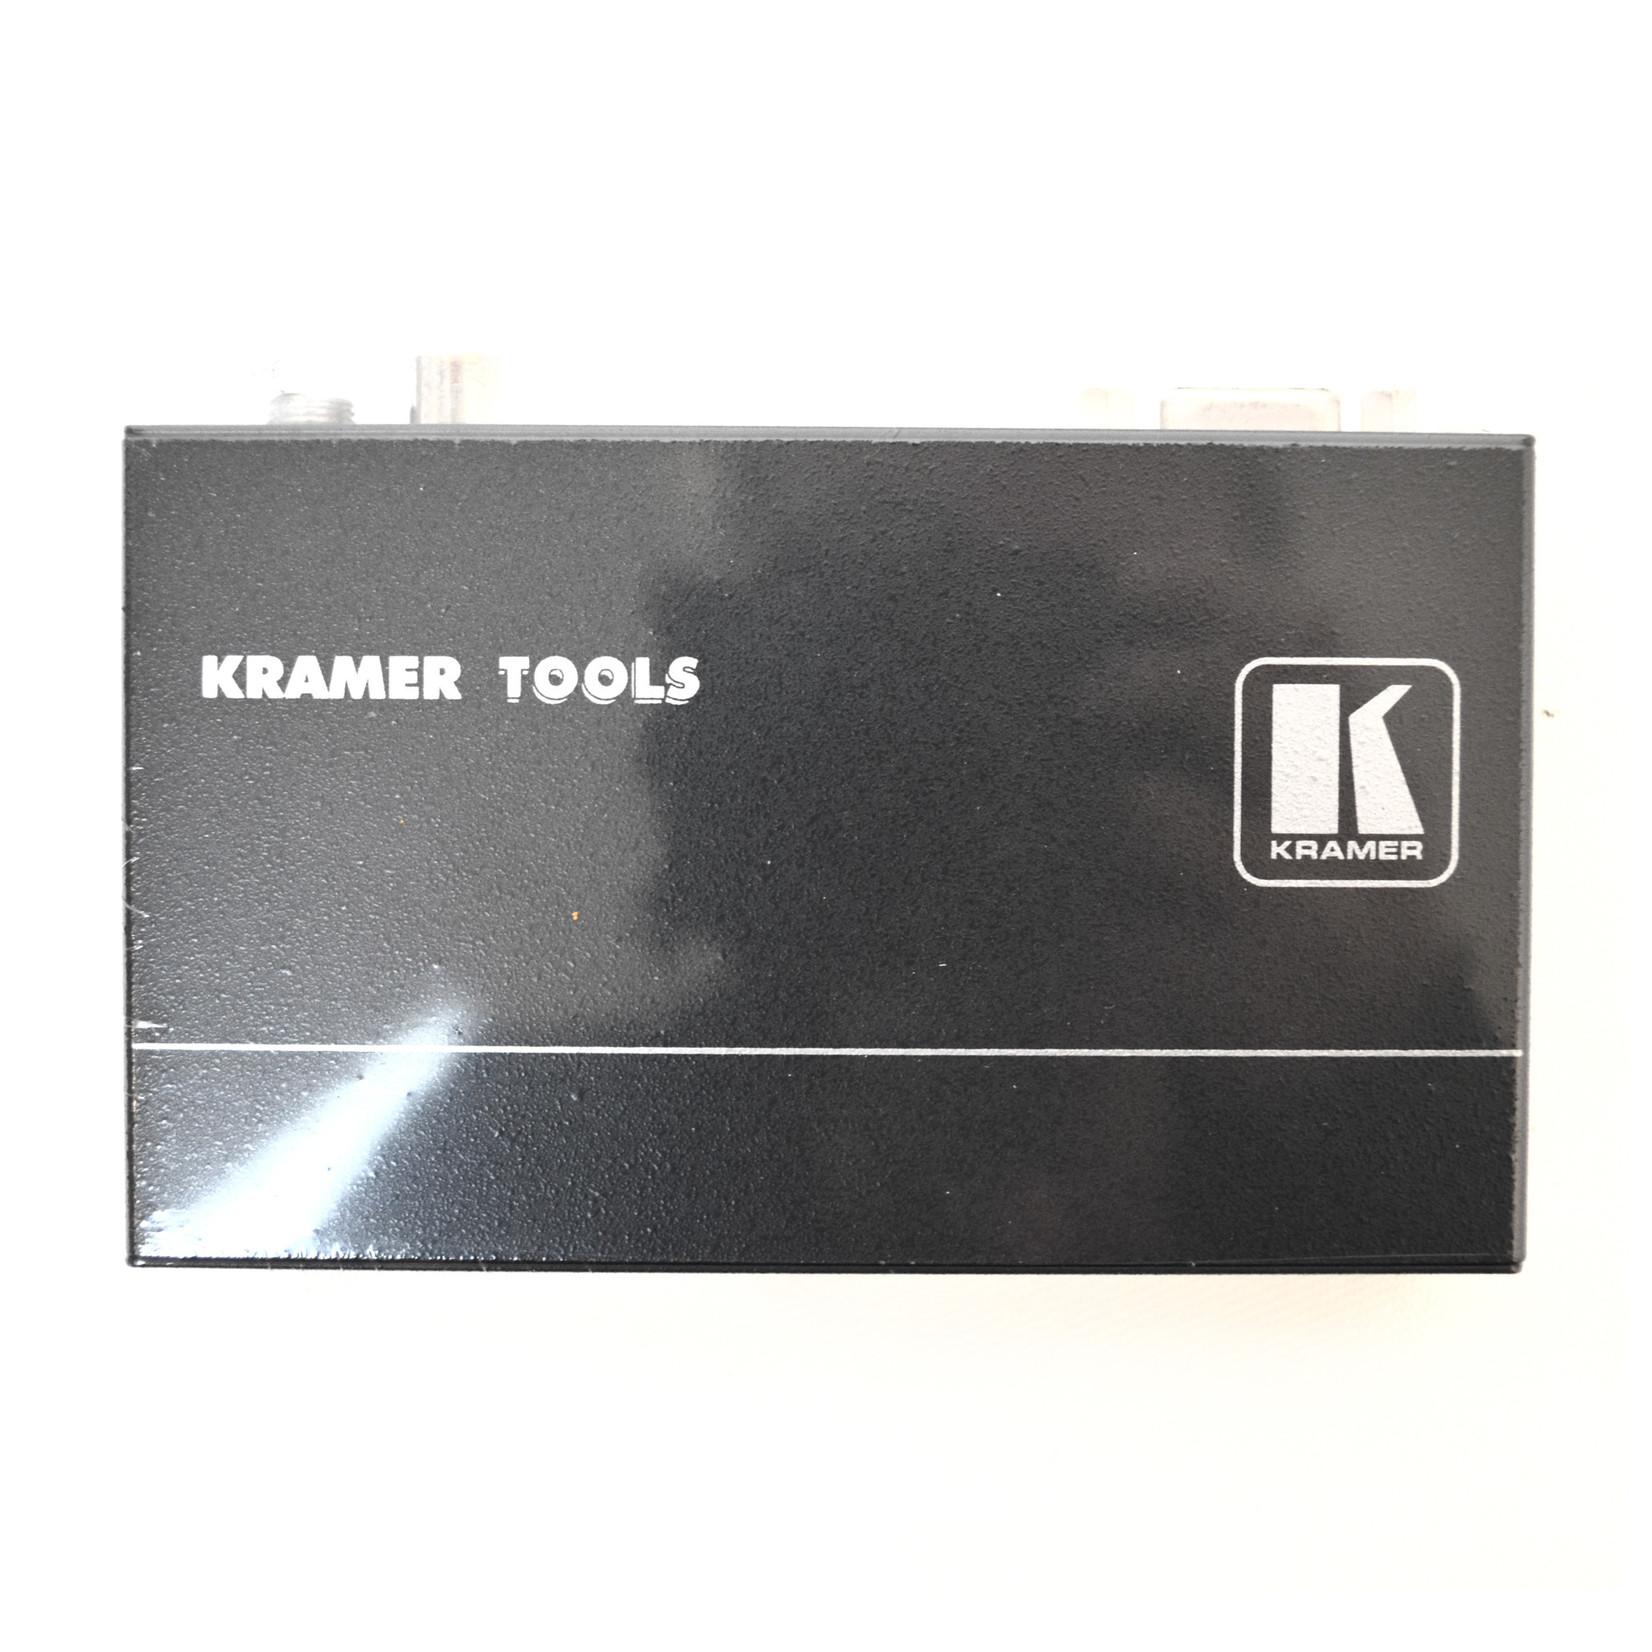 TP-122x1 UXGA; Audio Line Receiver